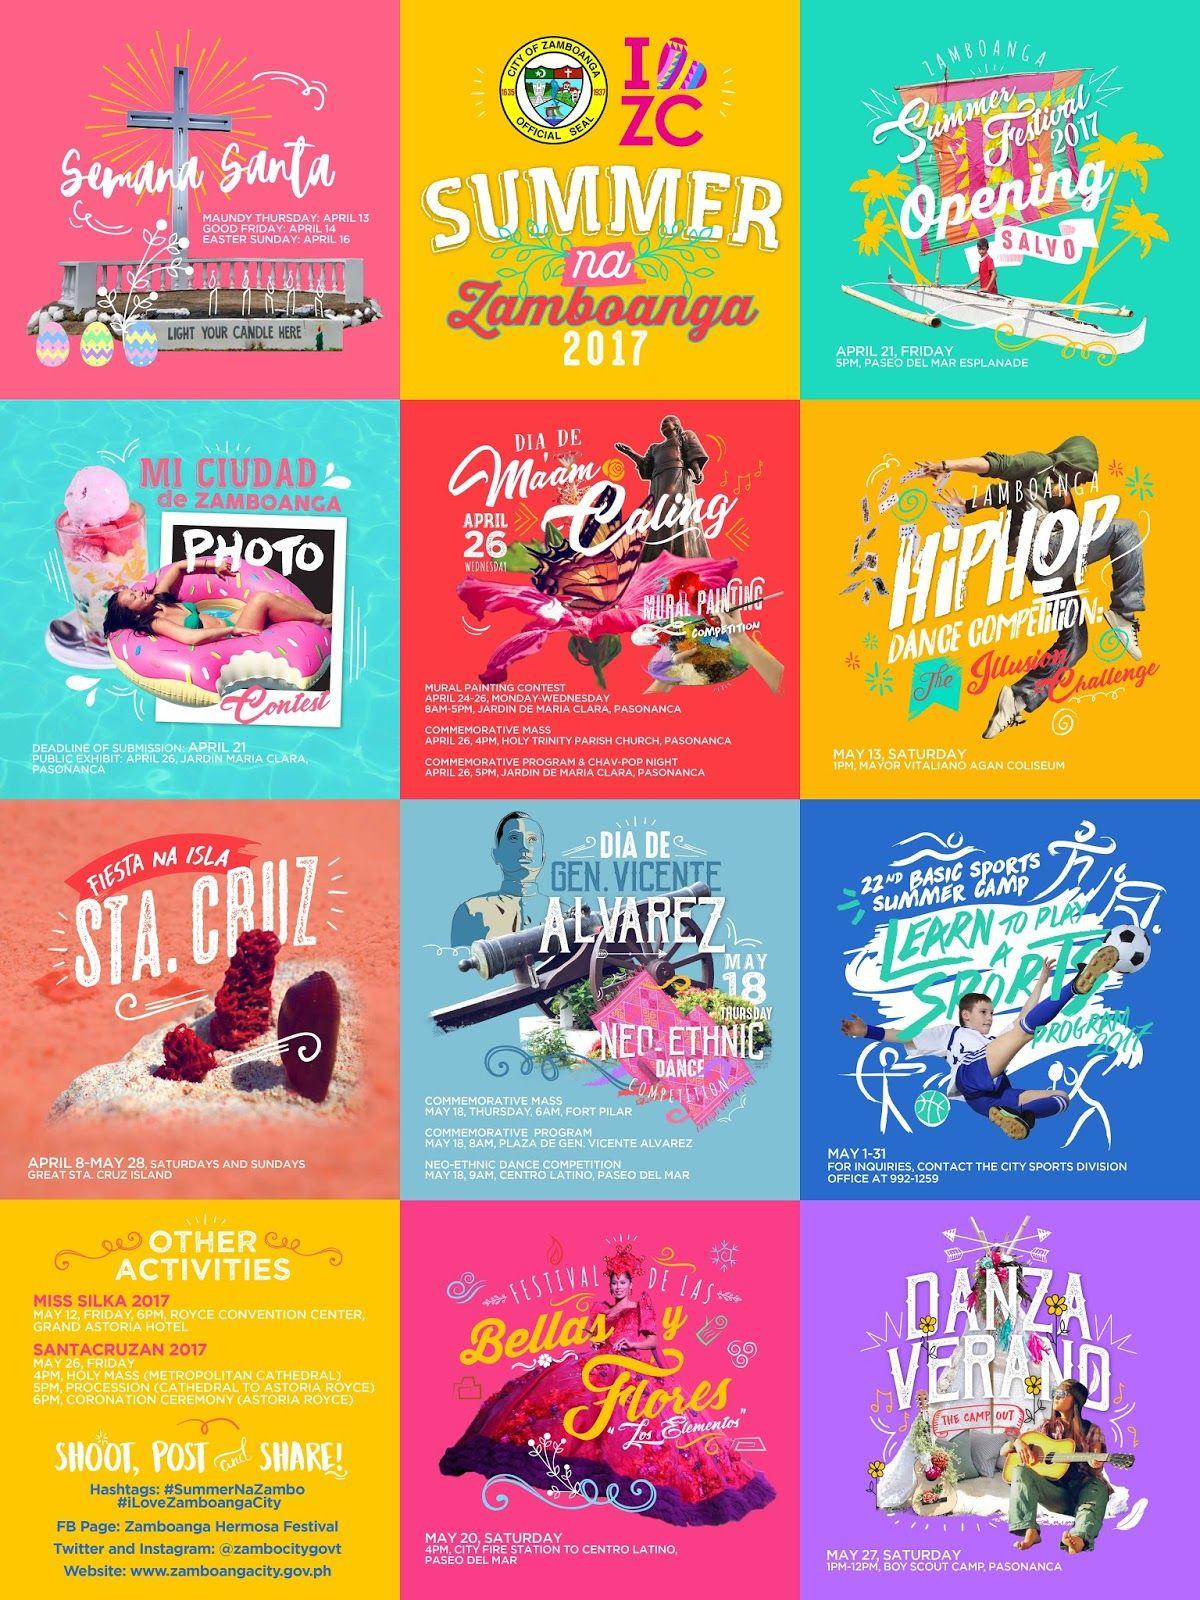 Poster design program - Zamboanga Summer Festival 2017 Summer Na Zamboanga Poster Design By Ced Zabala Csz97 Blogspot